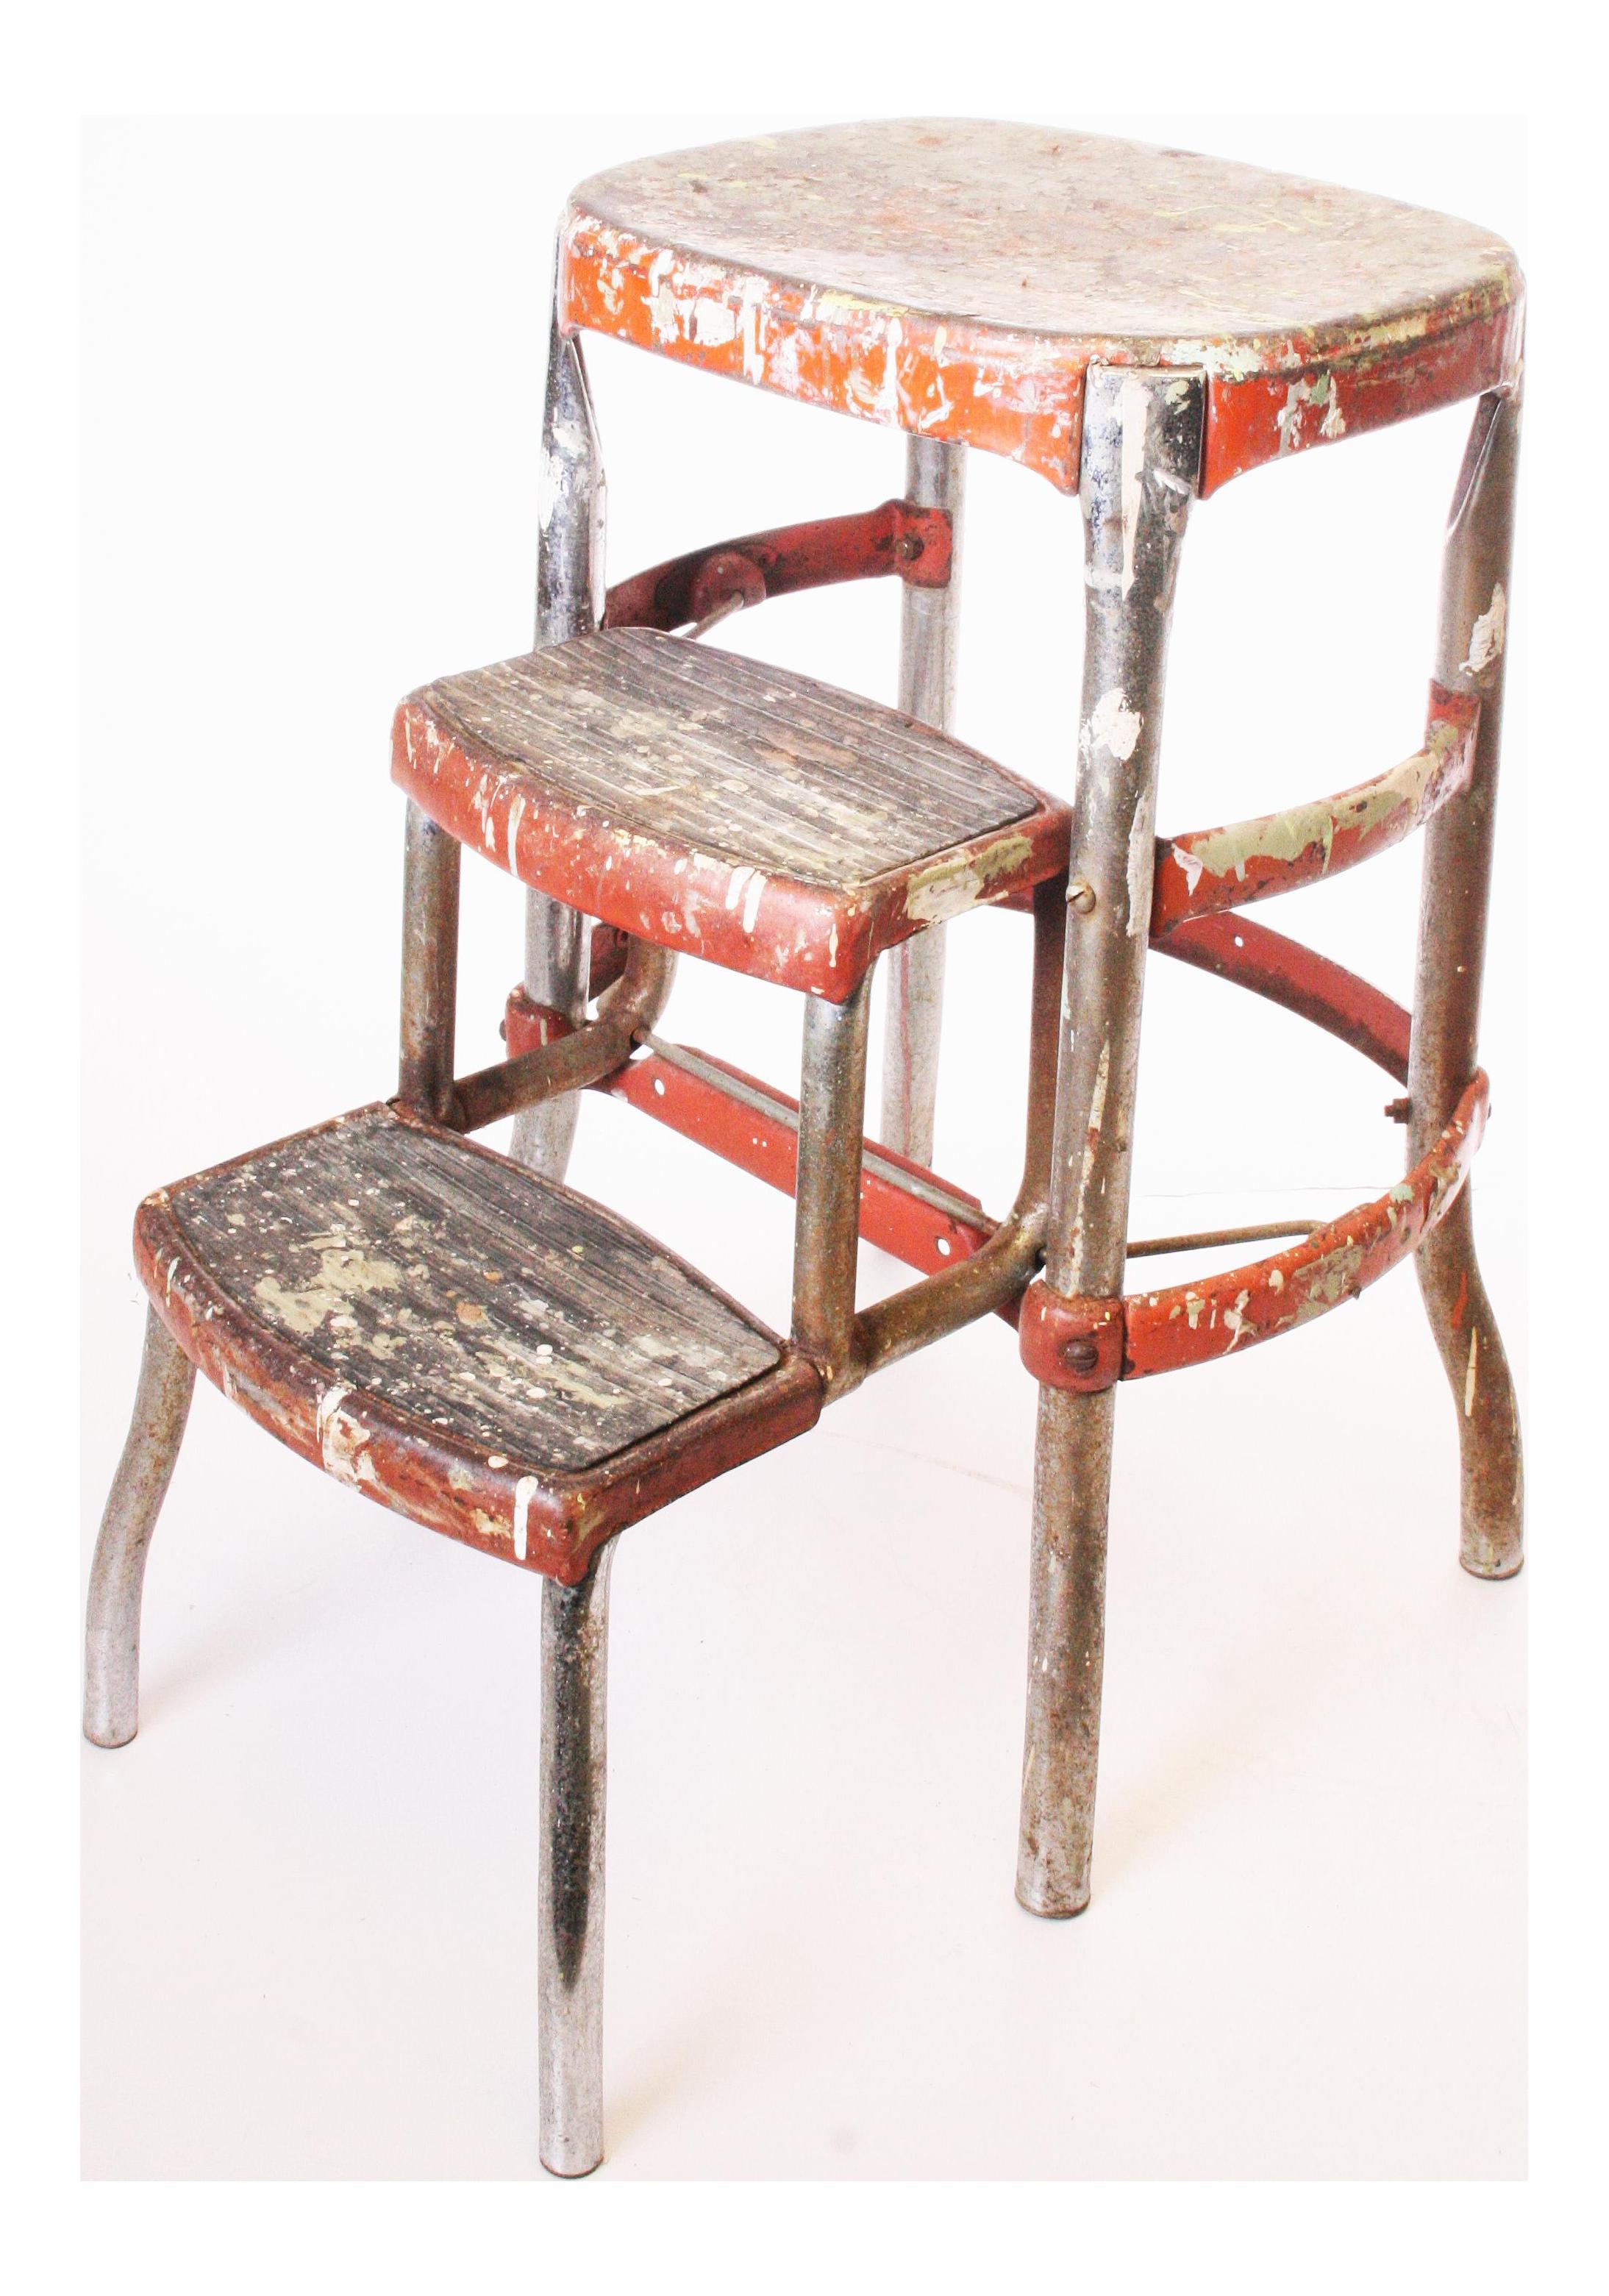 Vintage Industrial Metal Cosco Folding Stool Chairish